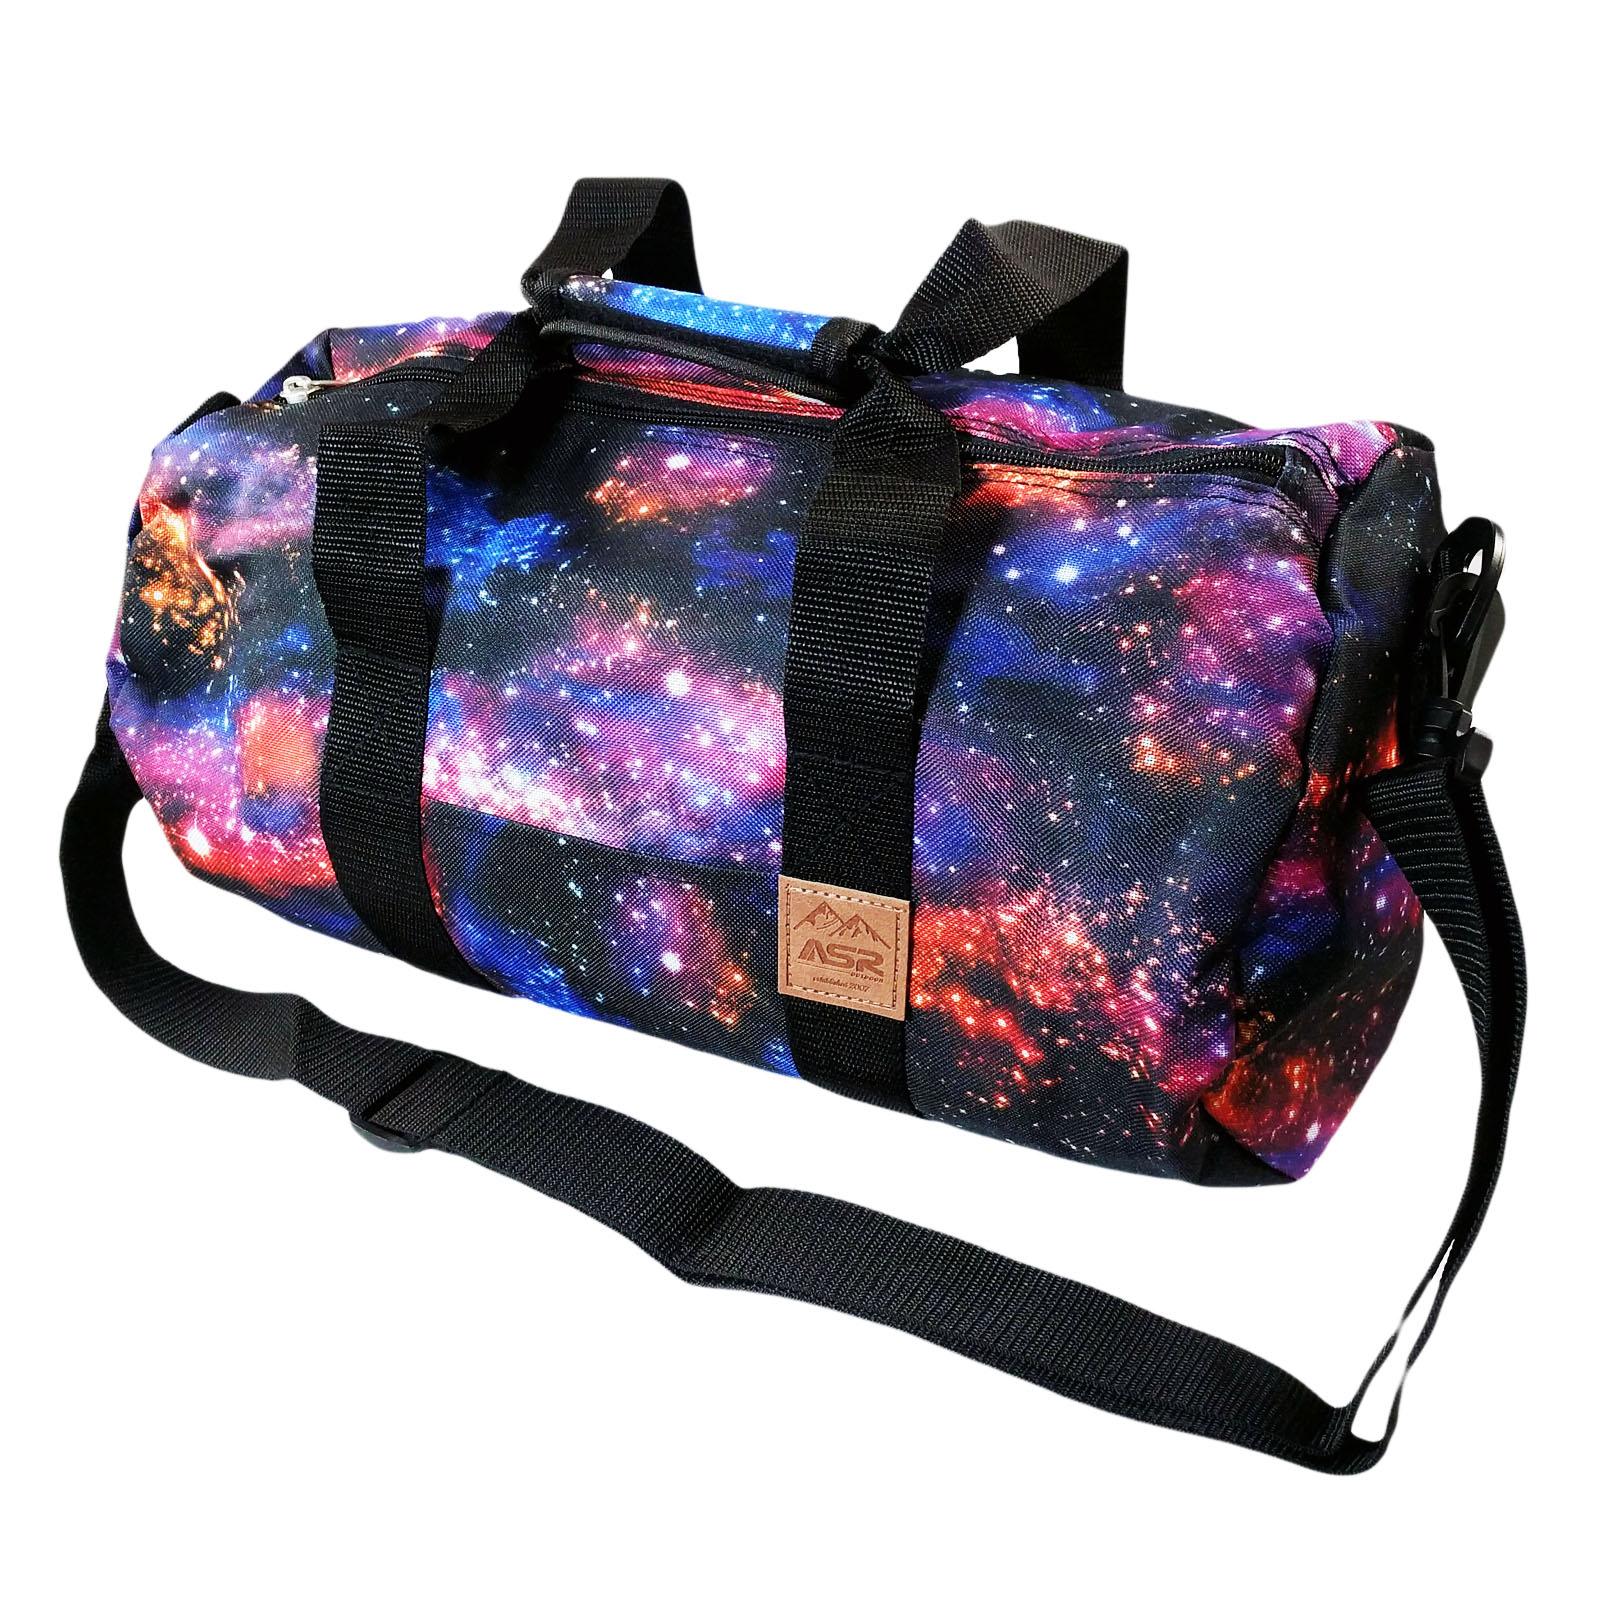 ASR Outdoor Galaxy Pattern Duffel Bag Shoulder Strap Blue